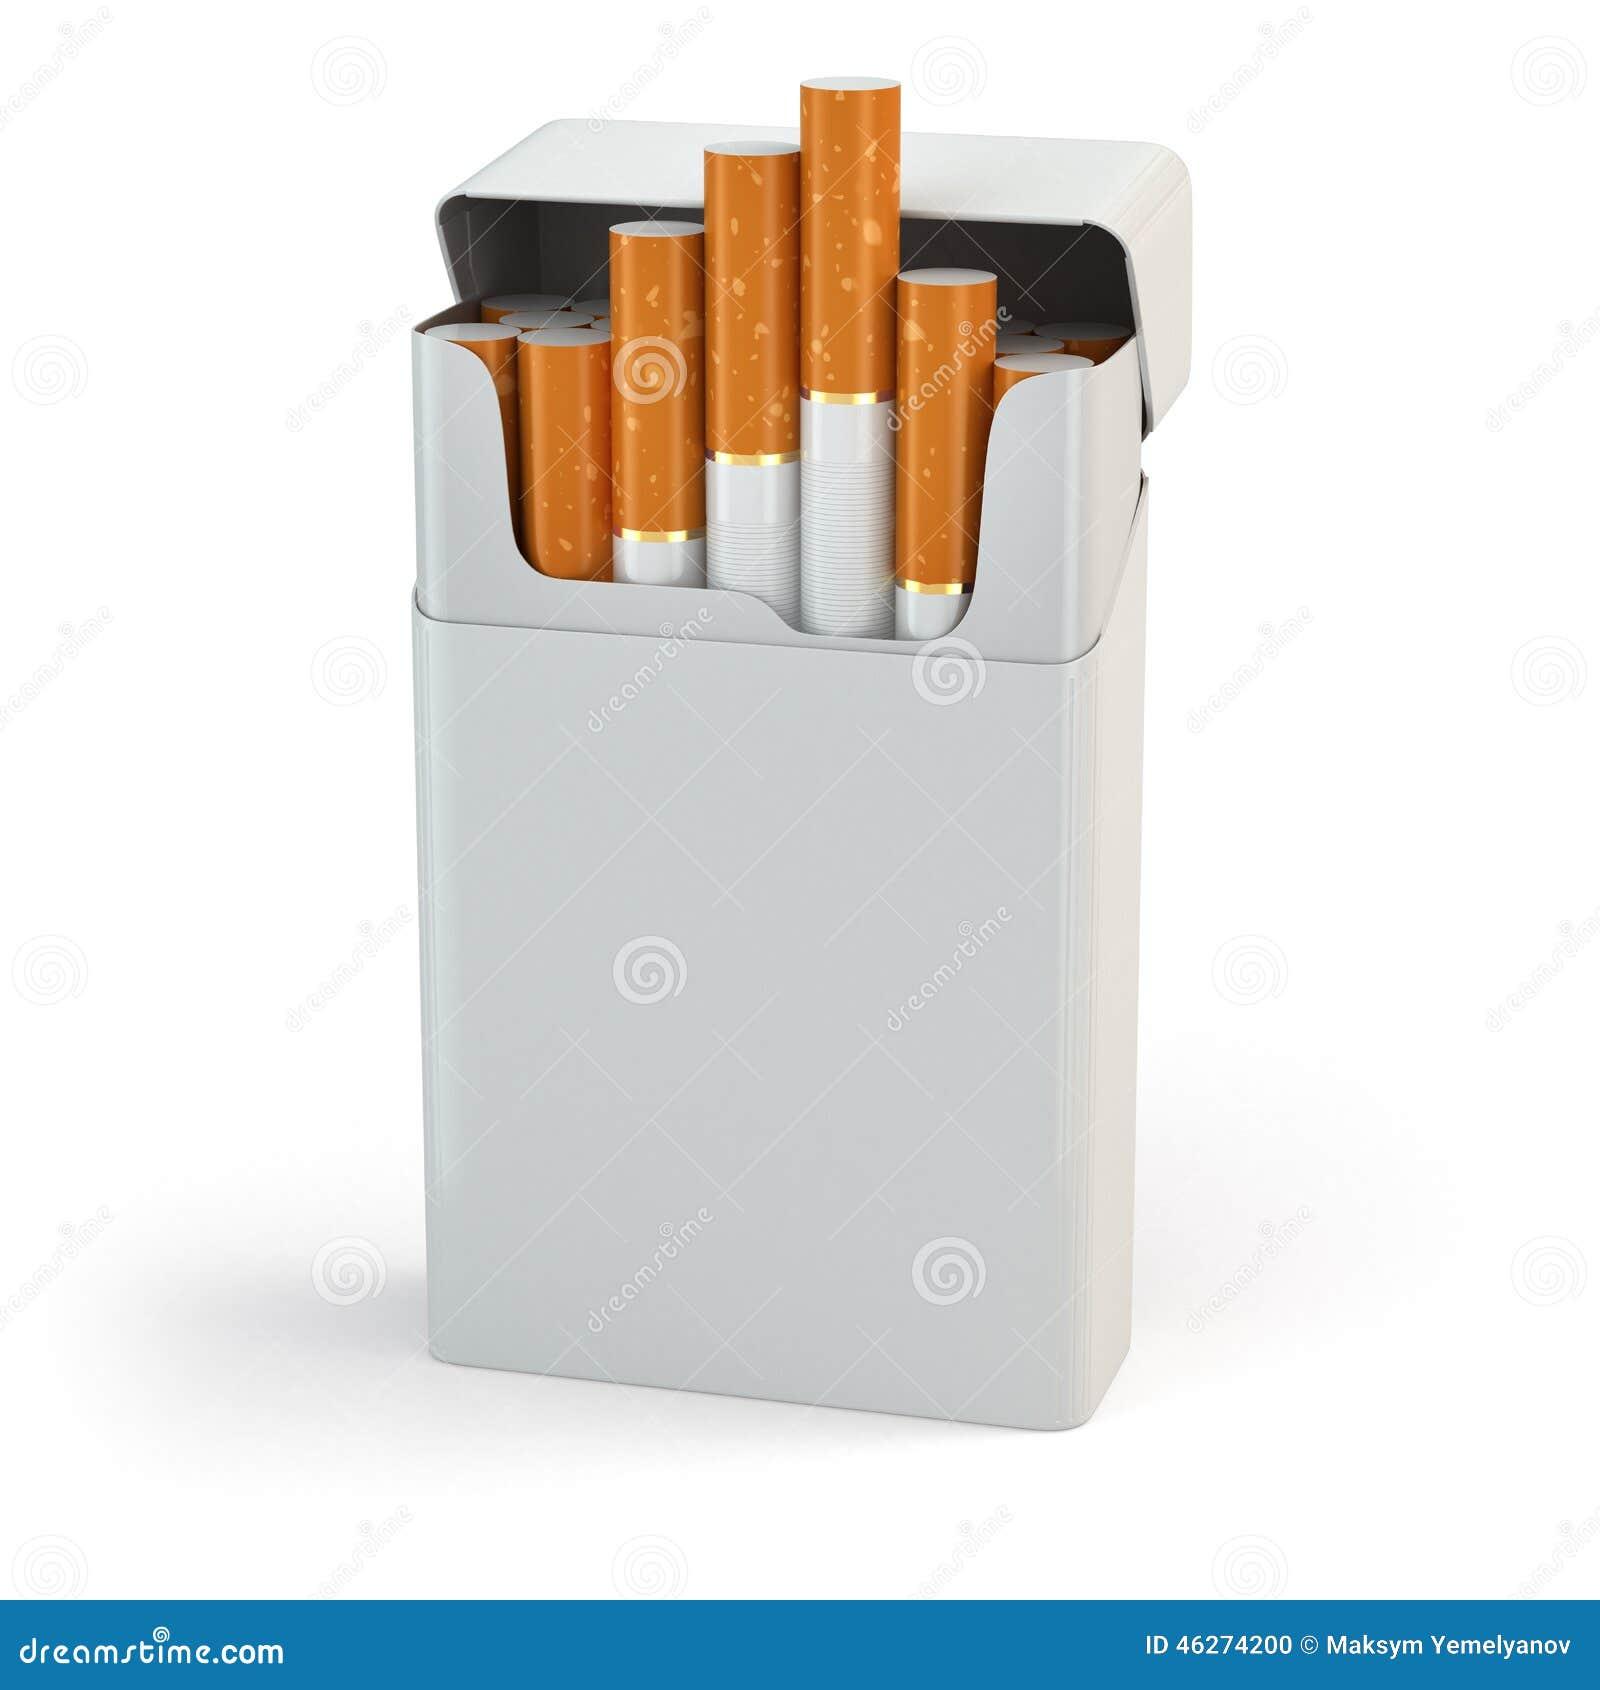 Open full pack of cigarettes on white background